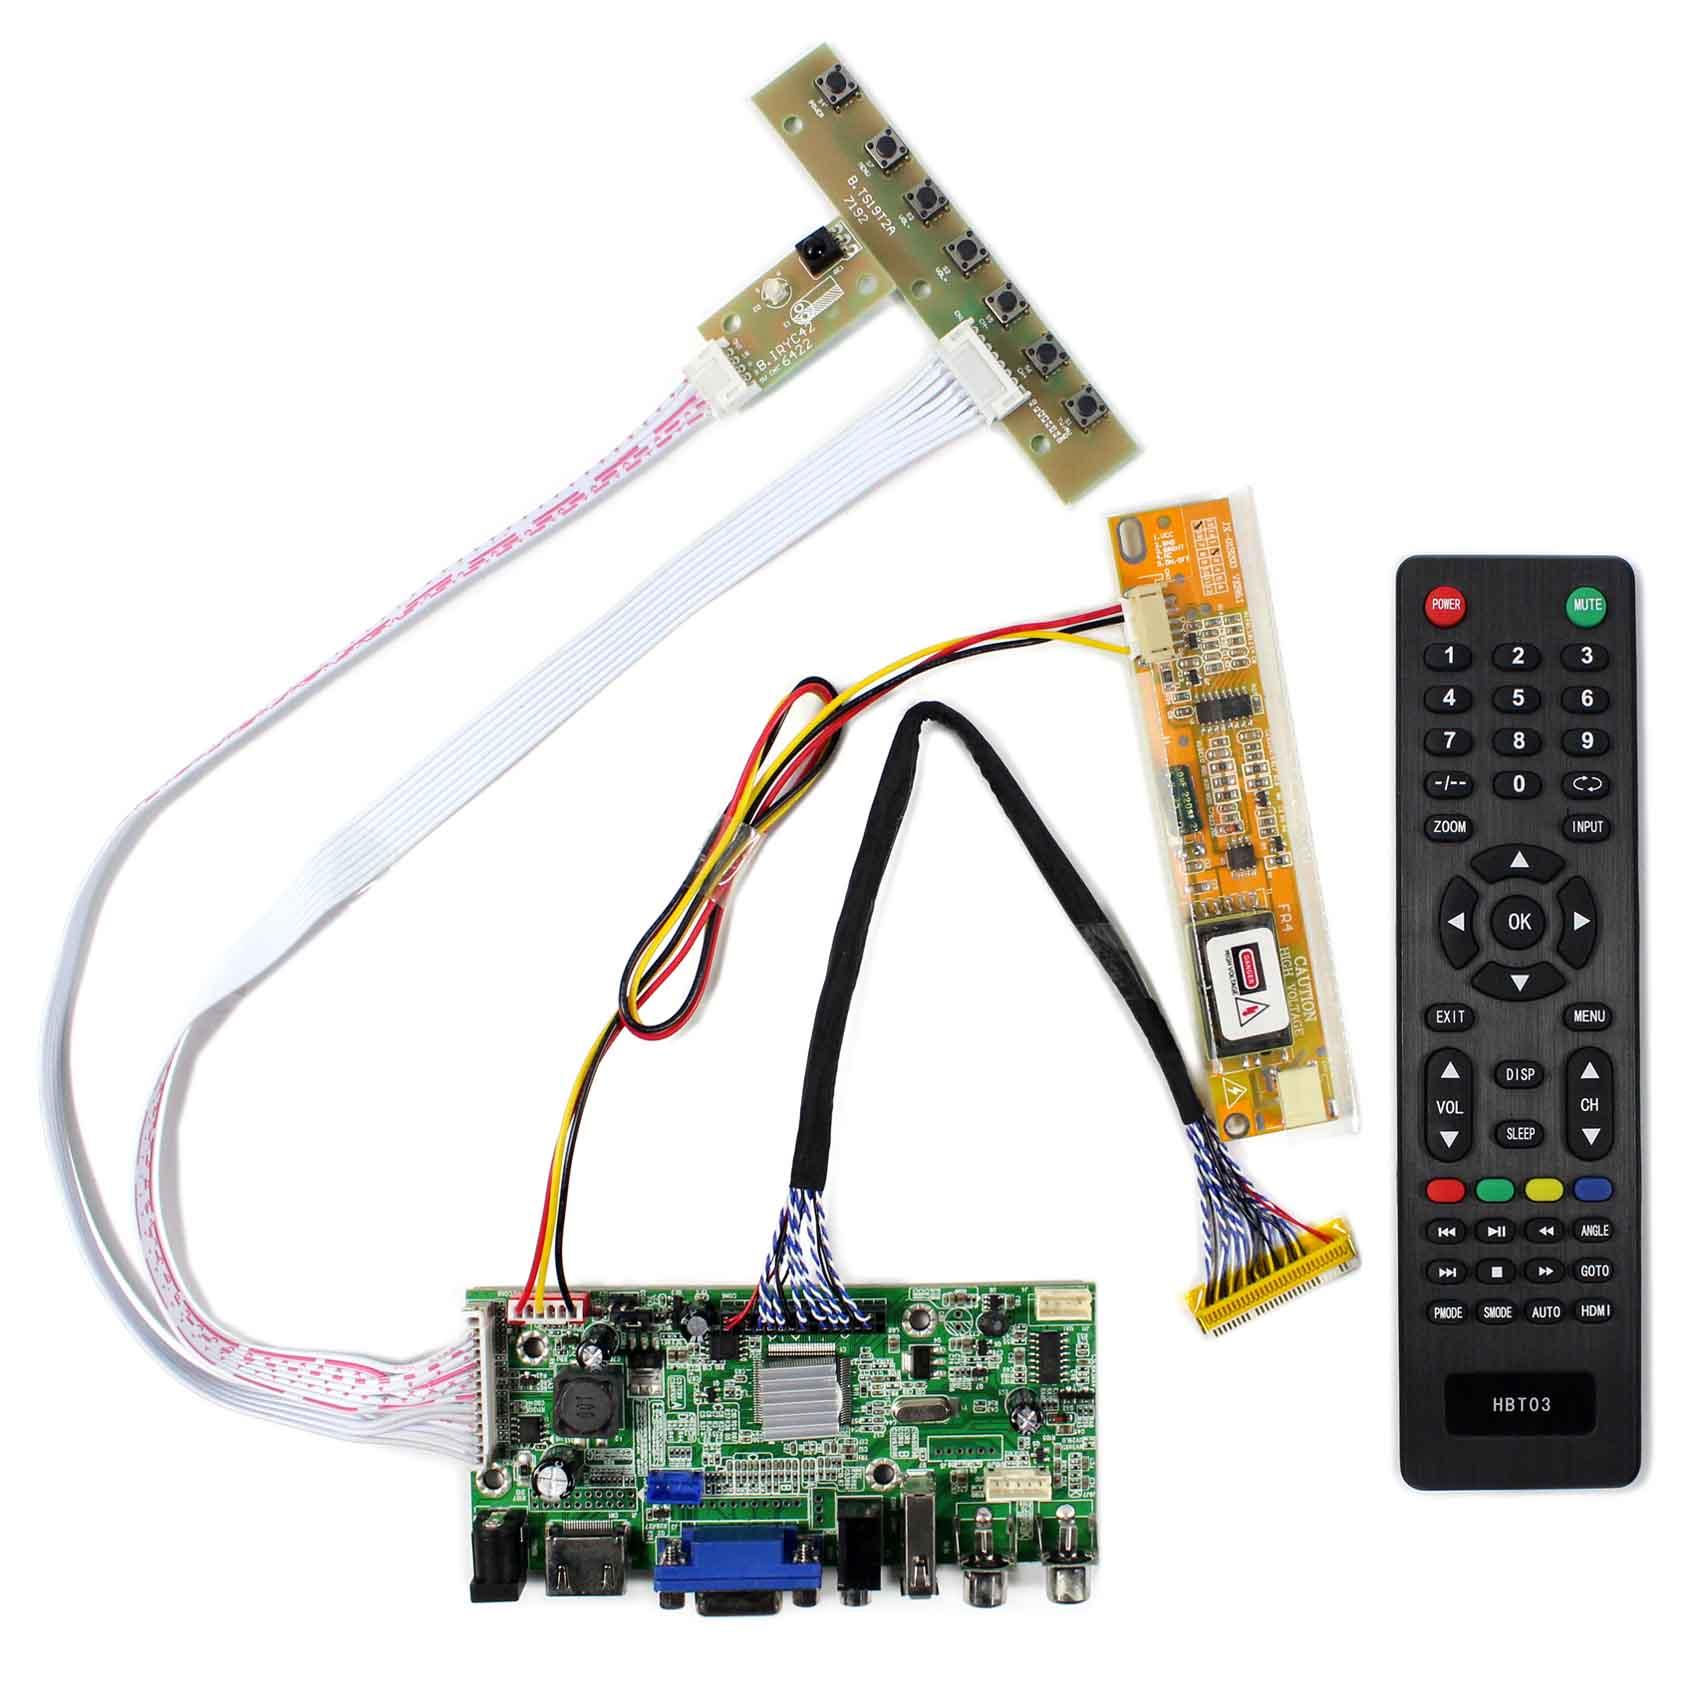 HDMI VGA 2AV USB Audio LCD Controller Board for 15 4inch 17inch 1440x900 LP154WP1 B170PW03 LCD